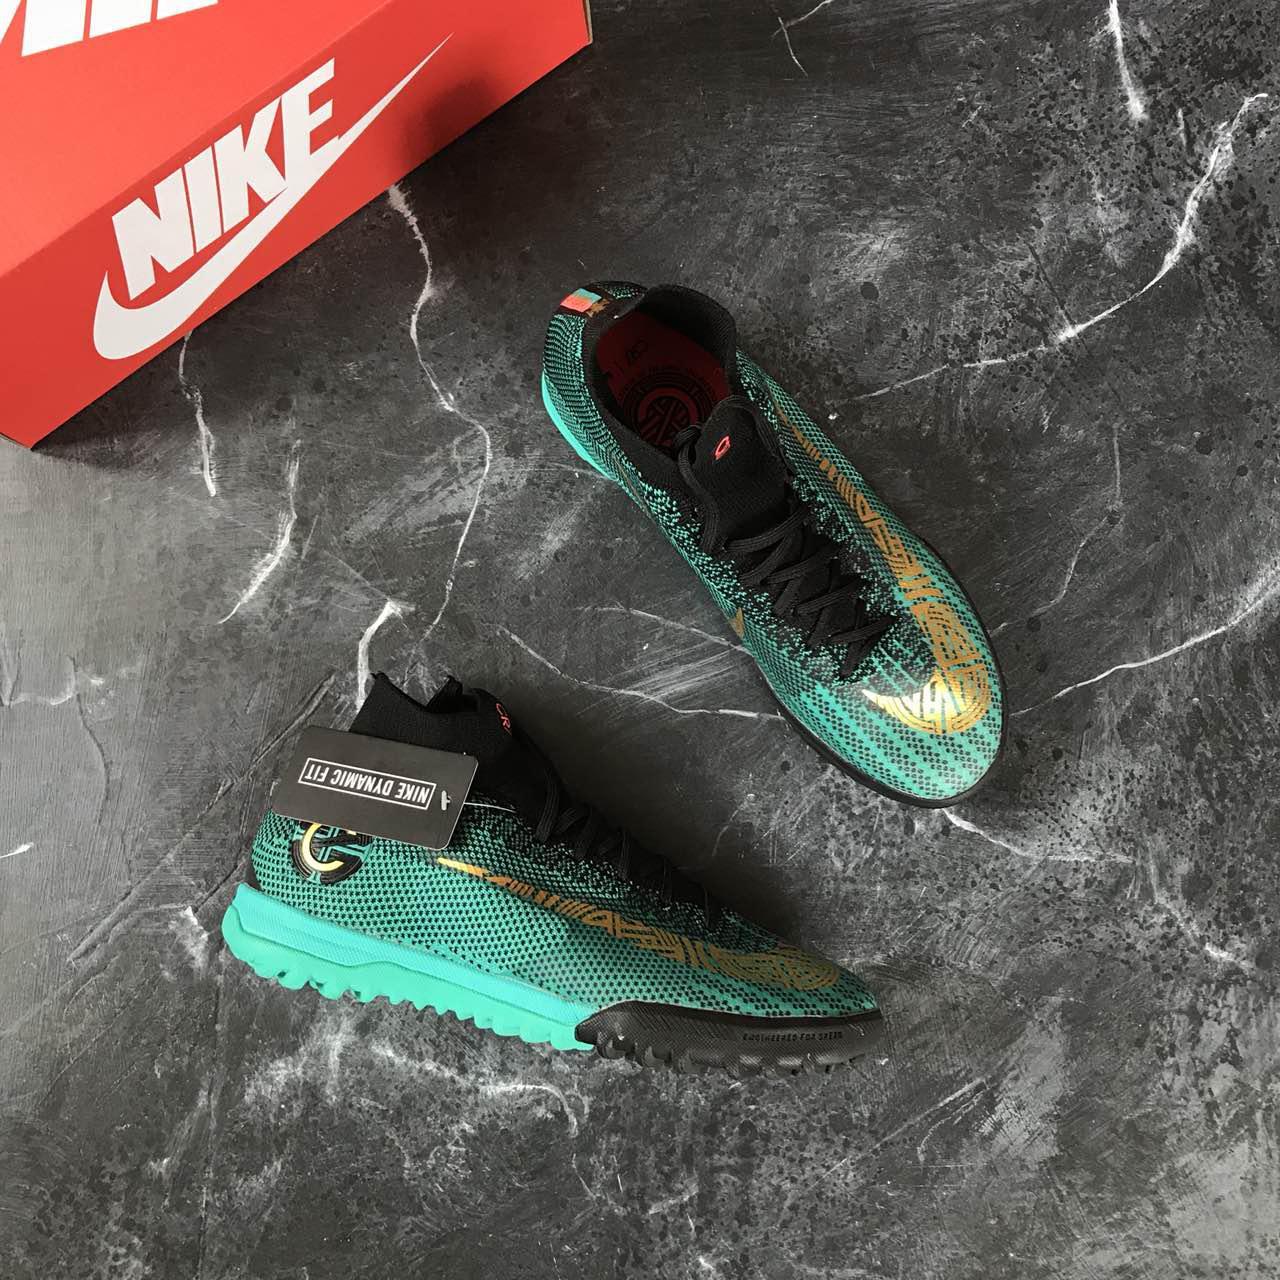 21635076 Детские Сороконожки Nike Mercurial SuperflyX KIDS VI Academy Ronaldo TF  -Clear Jade/Metallic Vivid Gold/Black